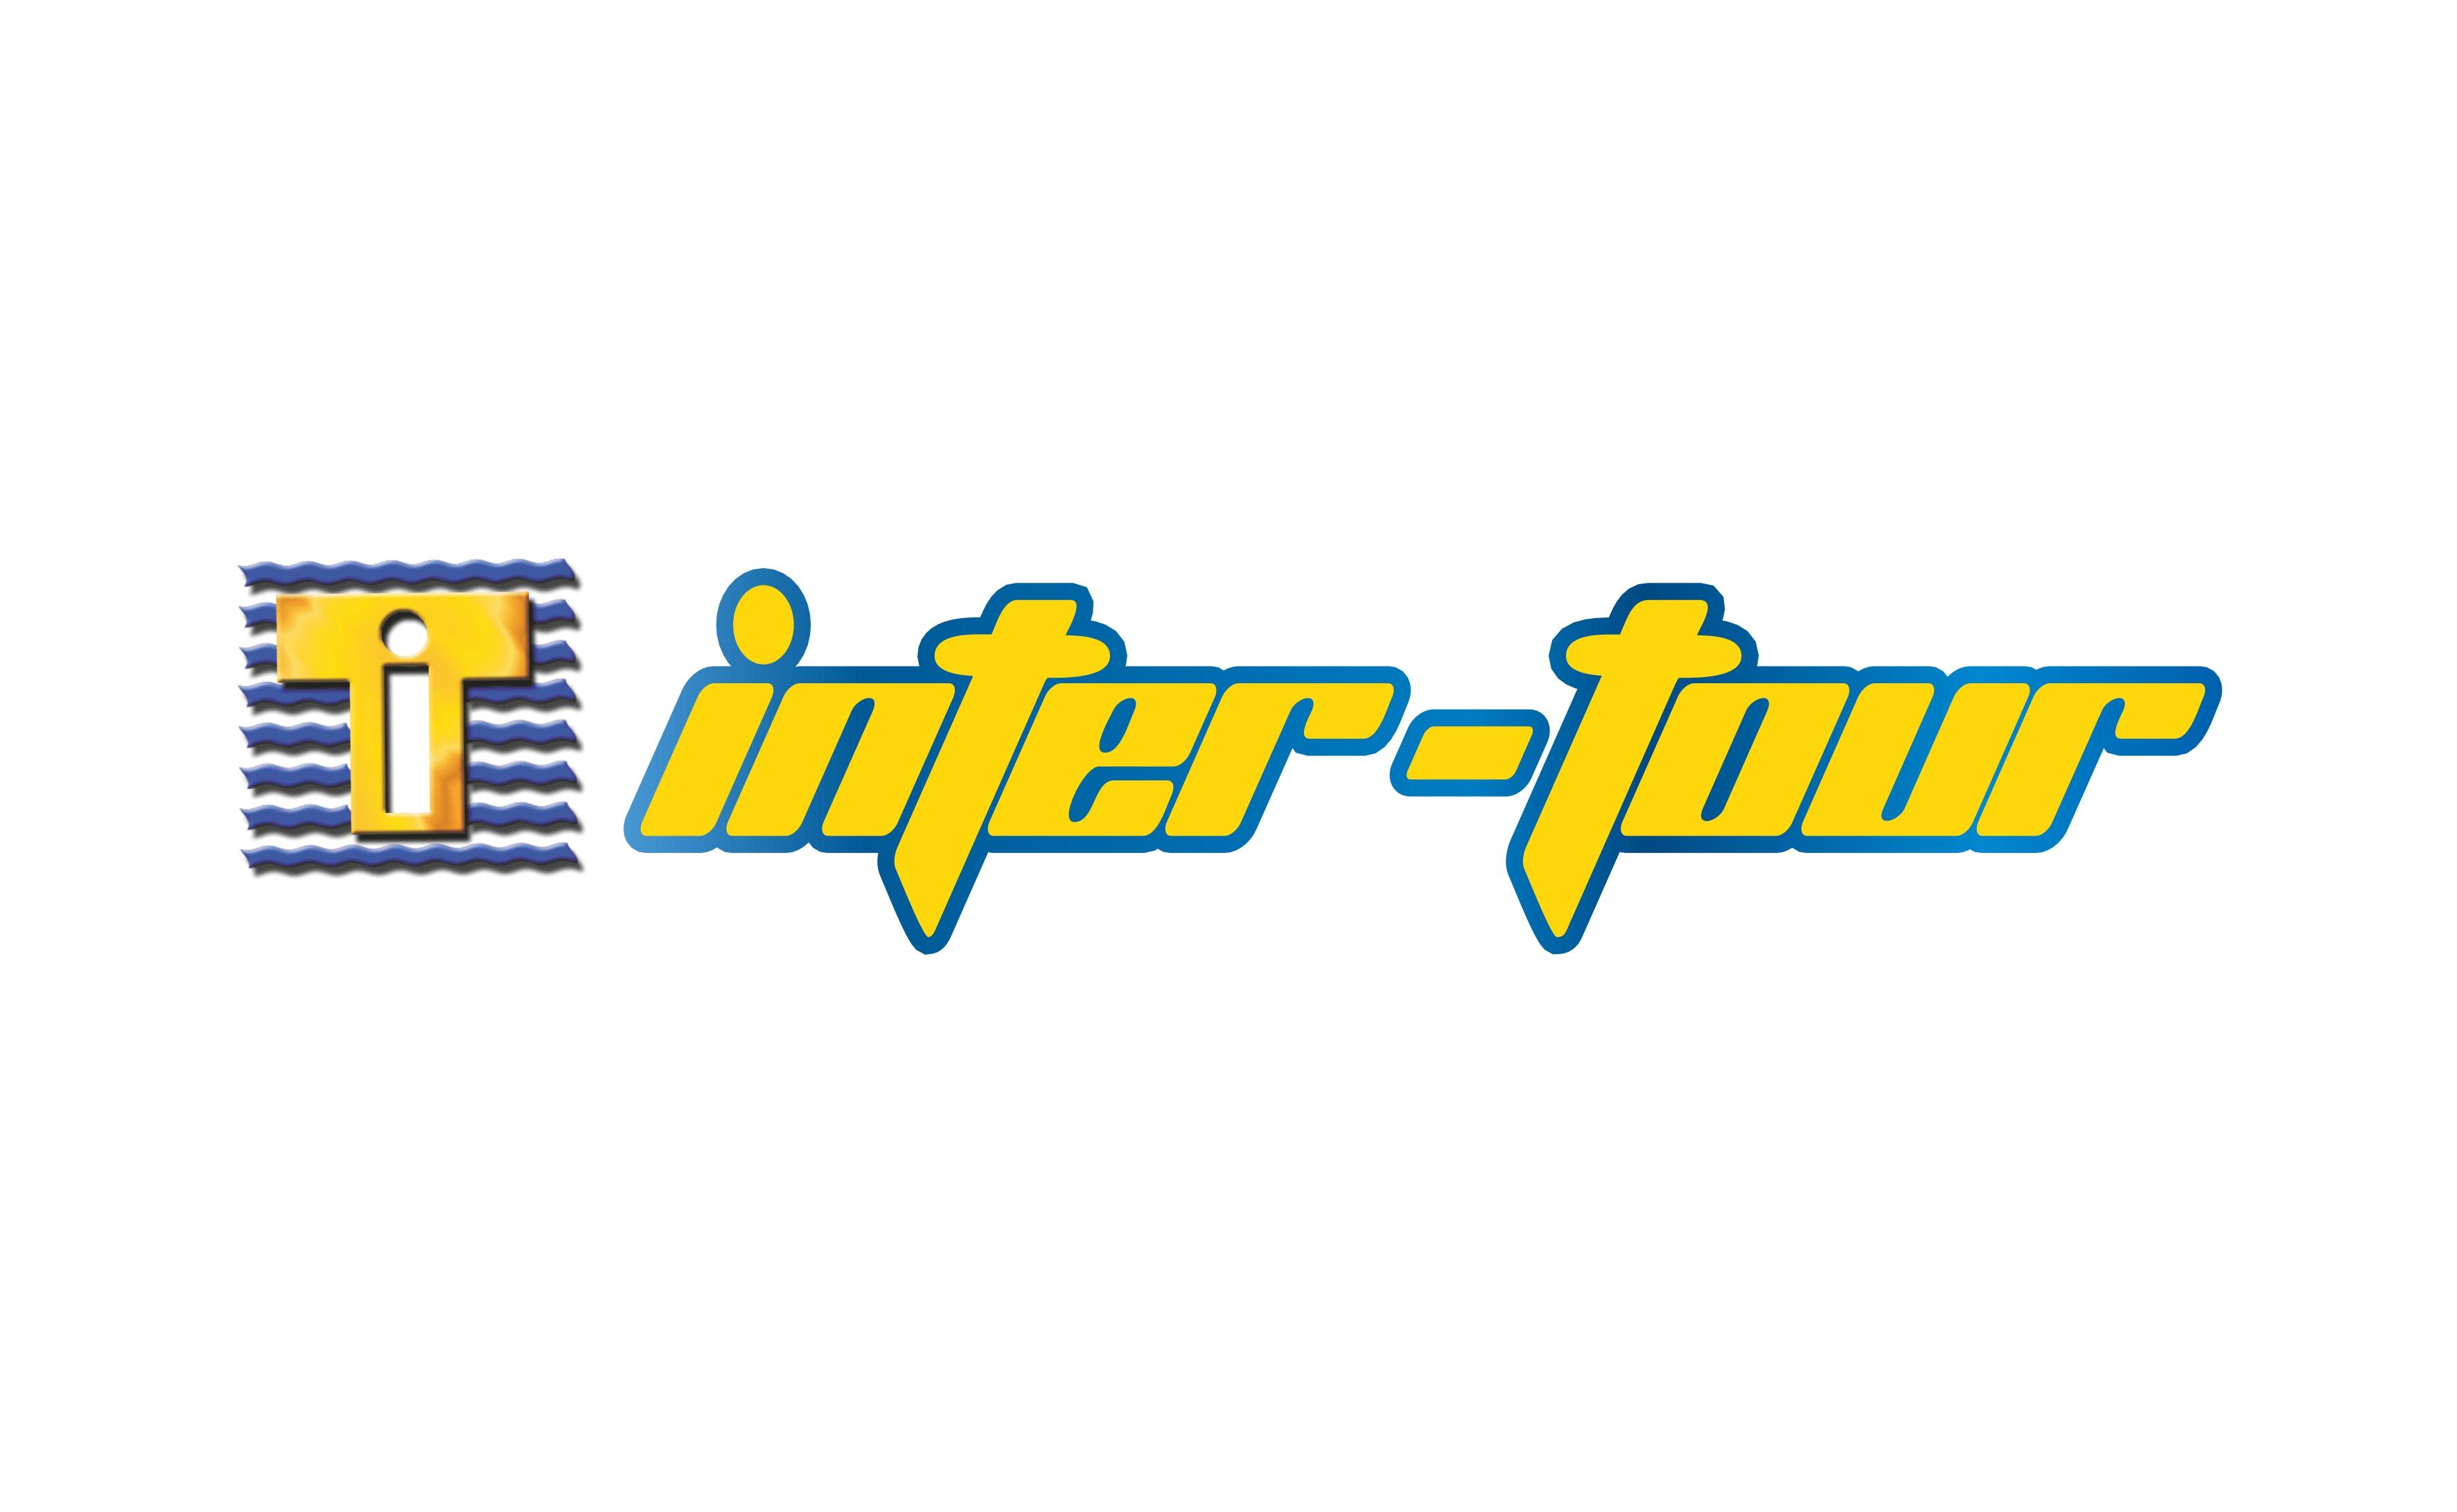 INTER-TOUR